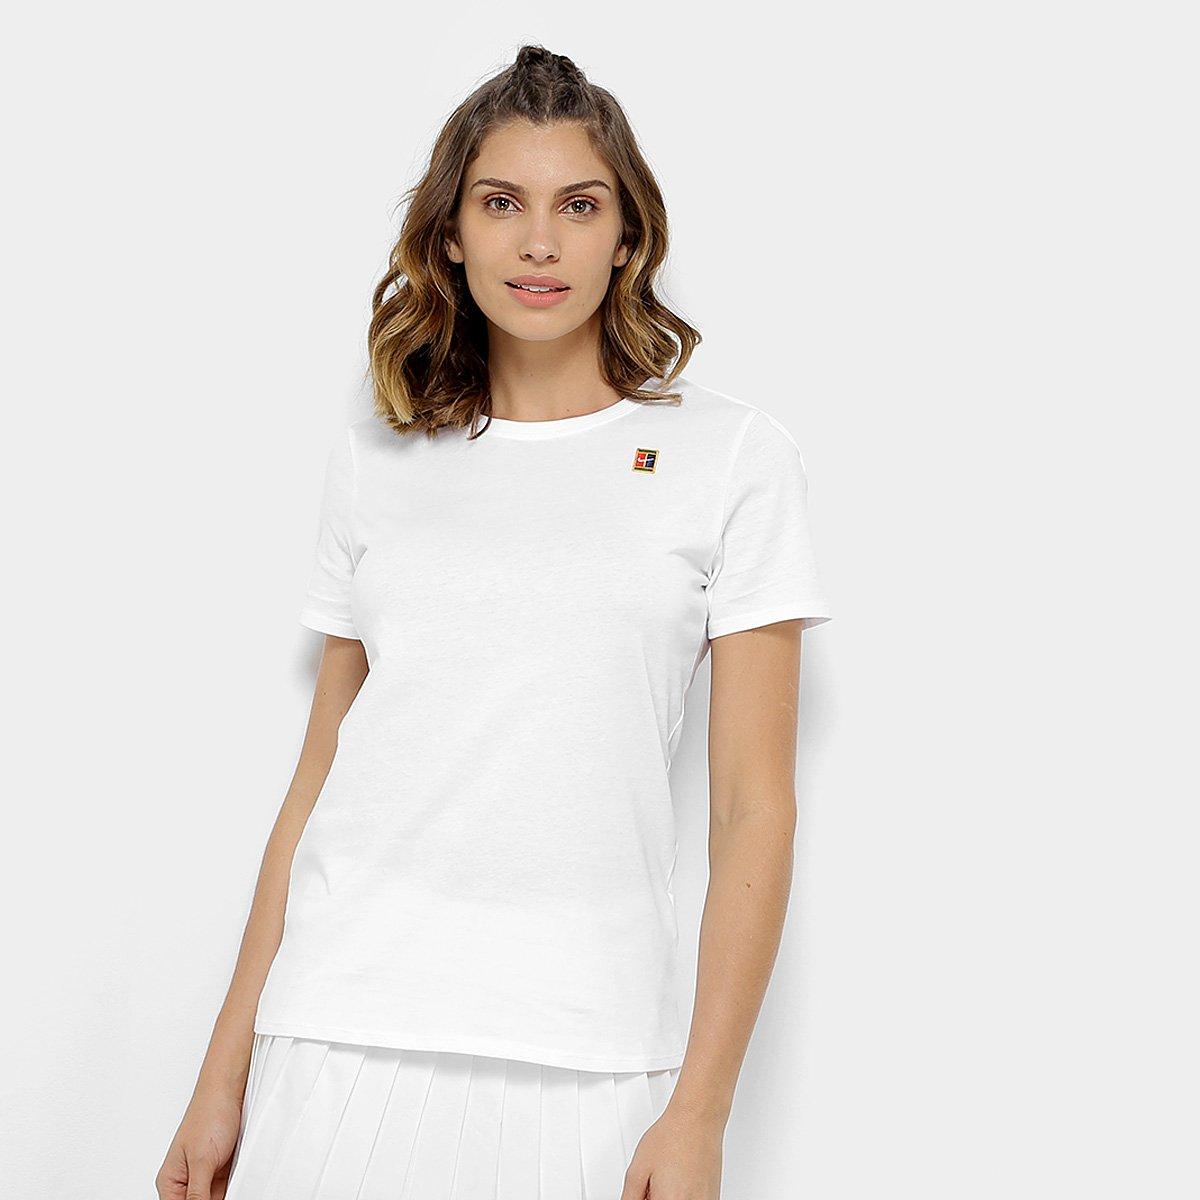 Camiseta Nike Heritage Feminina - Branco - Compre Agora  71a1e0840d5